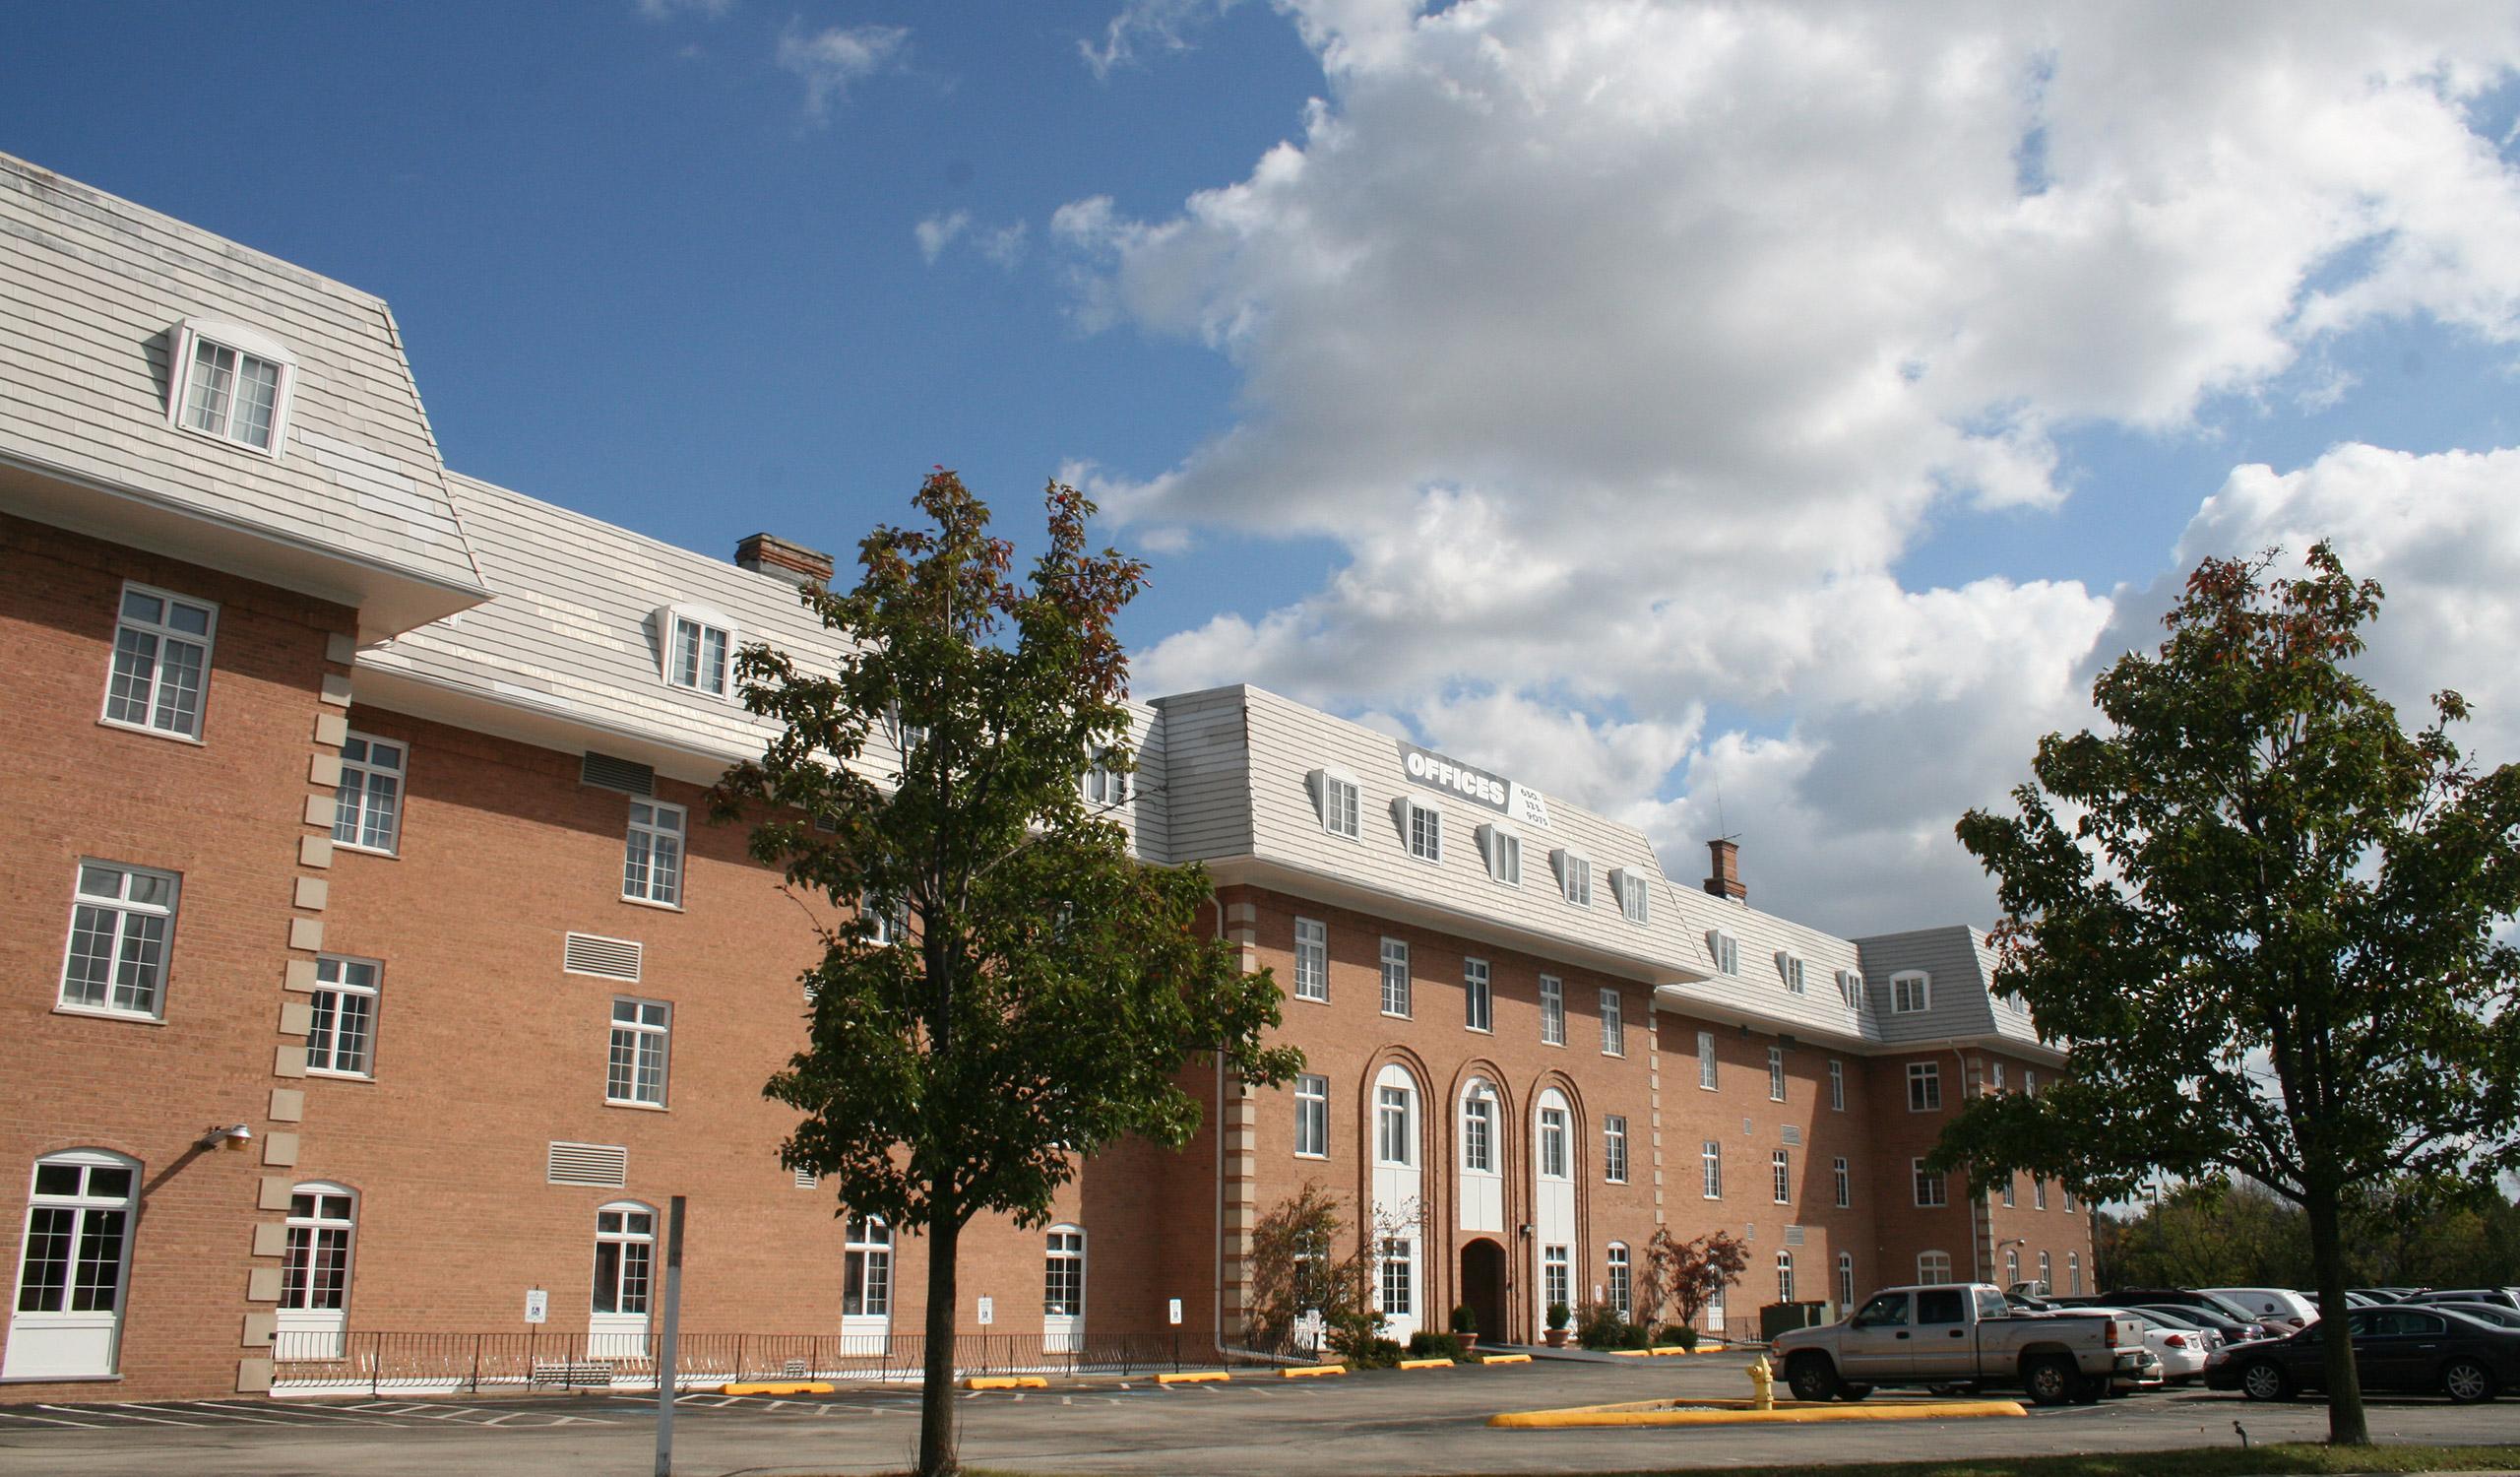 188 Industrial Drive Elmhurst, Illinois